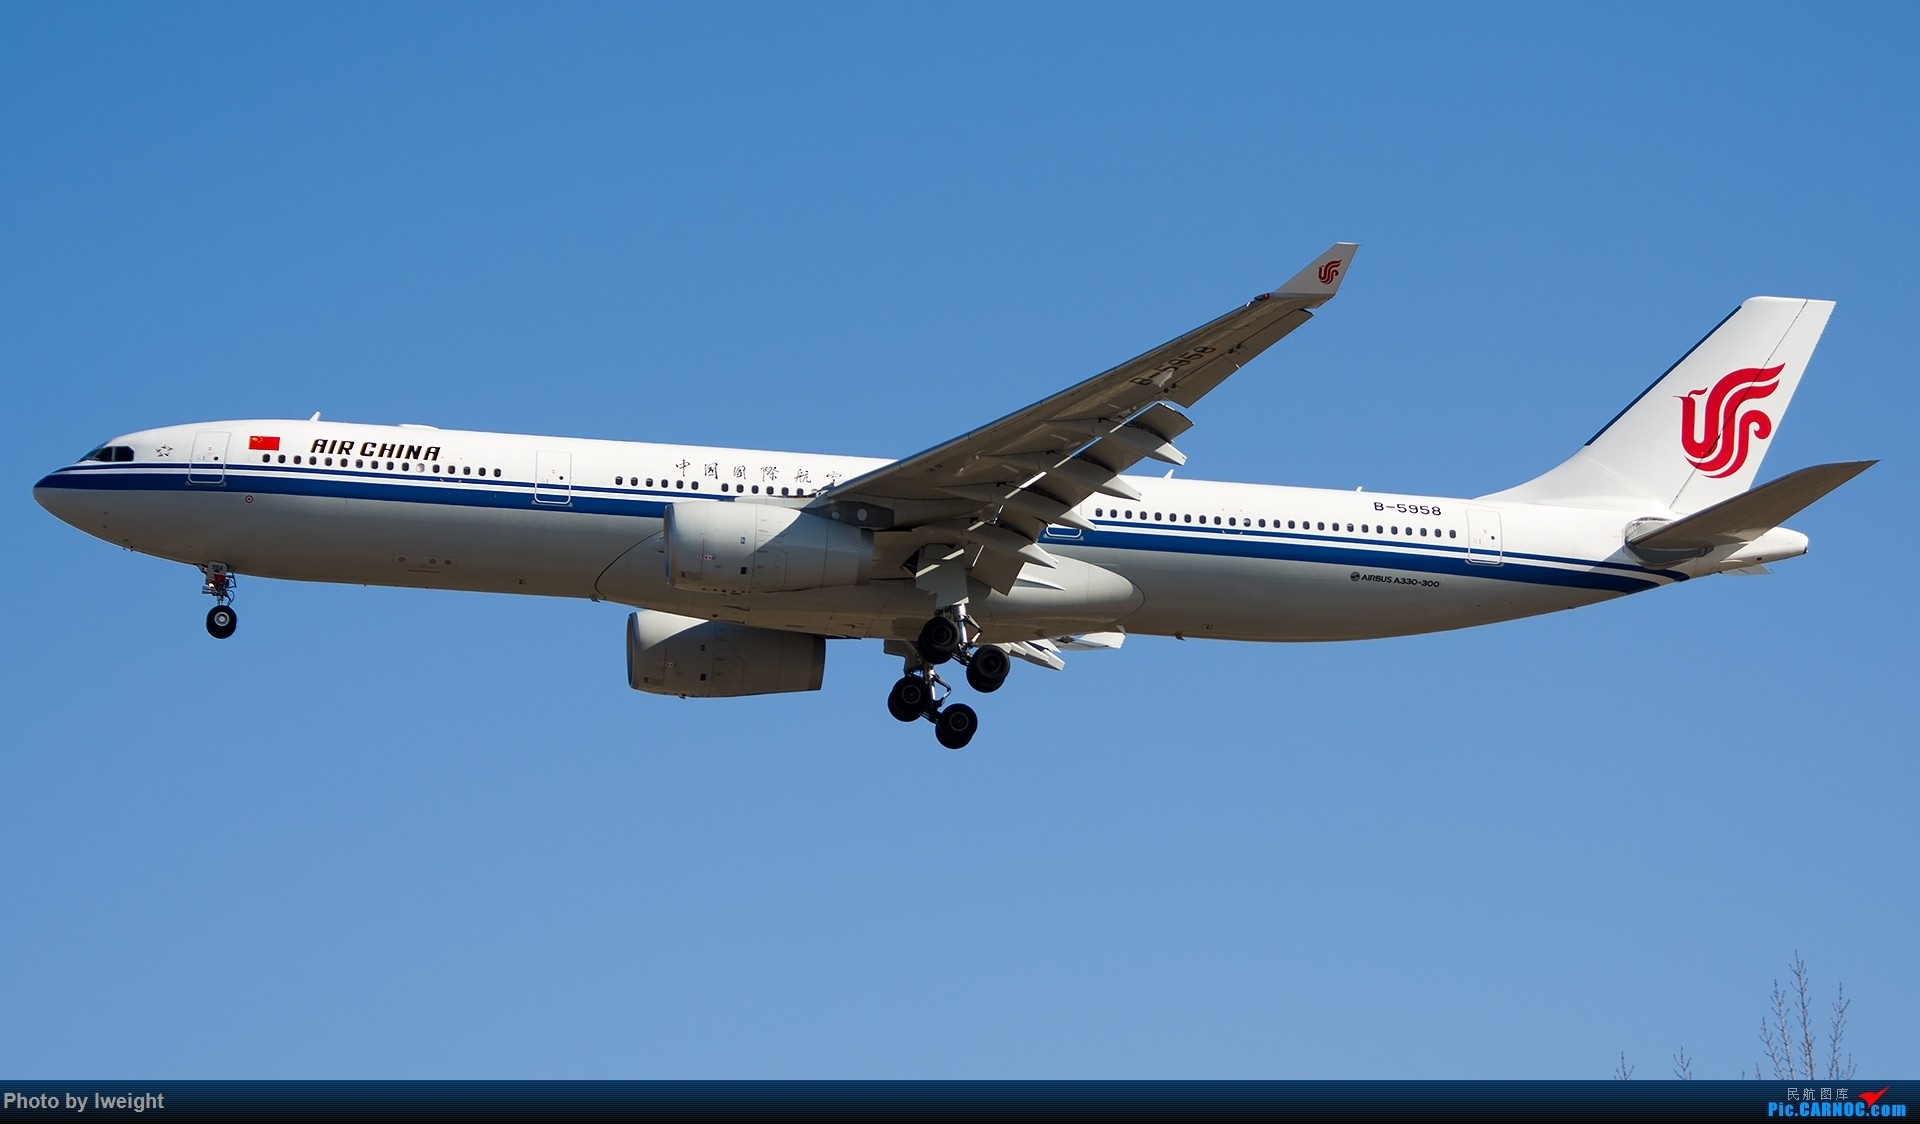 Re:[原创]北京难得的好天气,随手拍了一些渣图【2015-01-27】 AIRBUS A330-300 B-5958 中国北京首都国际机场